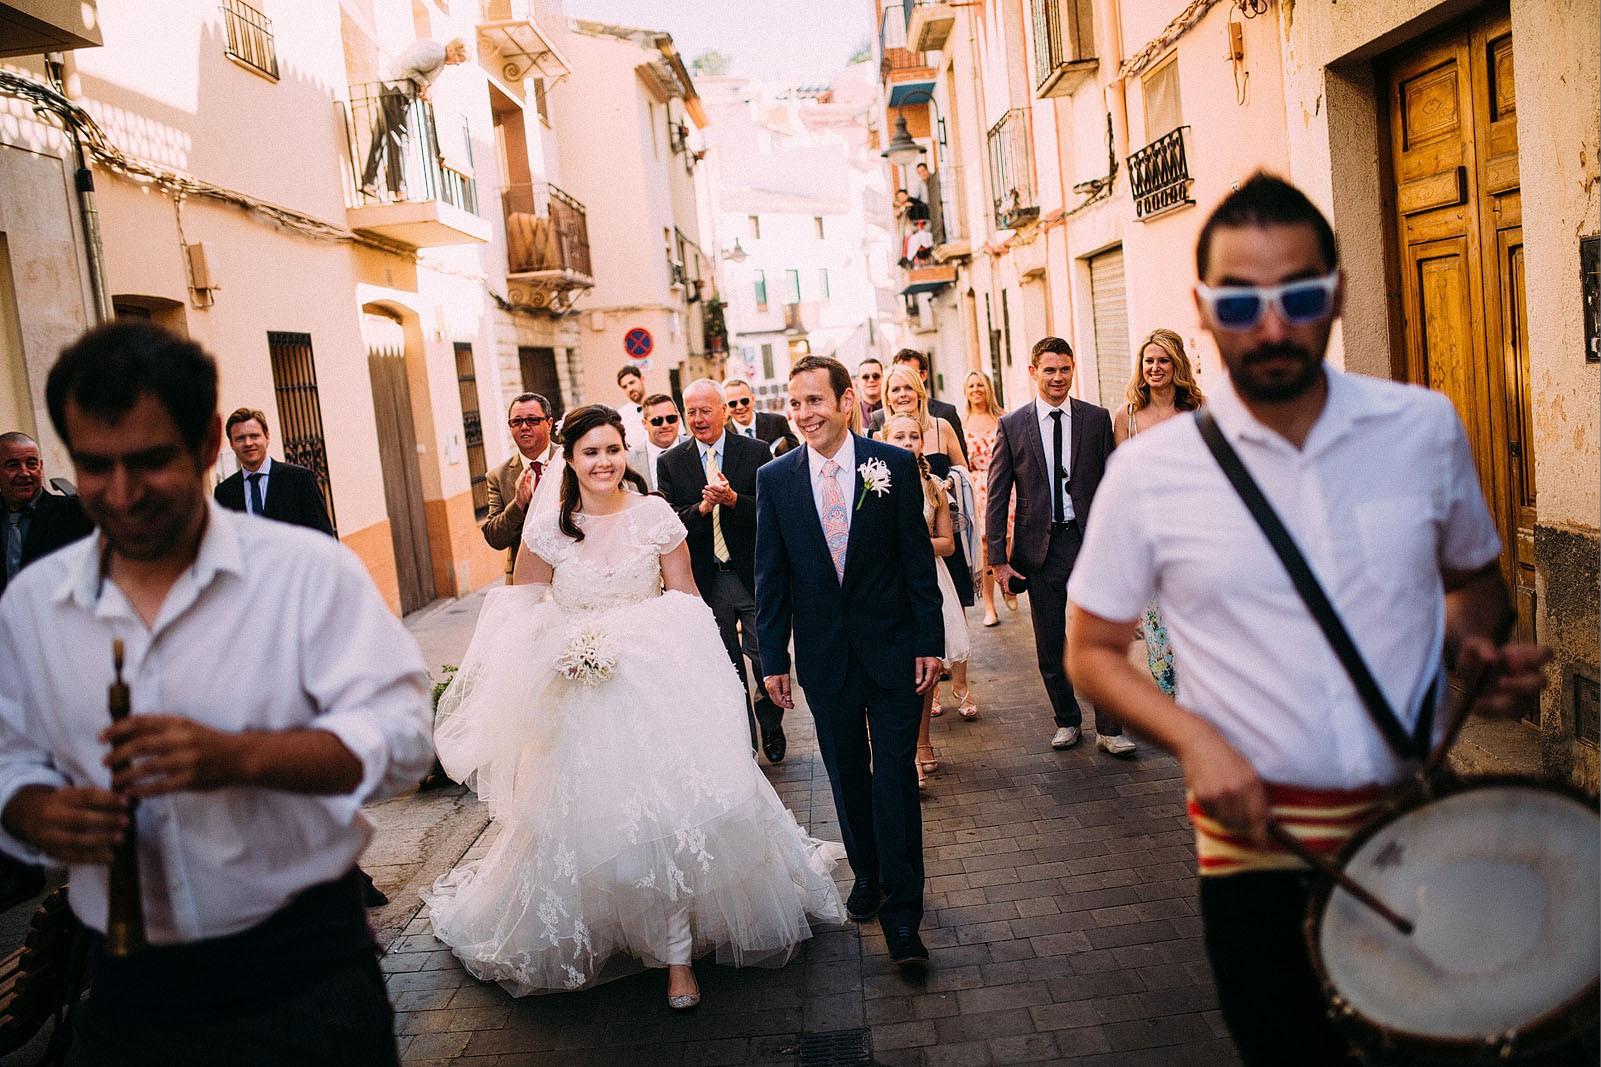 Bridebook.co.uk- bride groom and party walking behind musicians